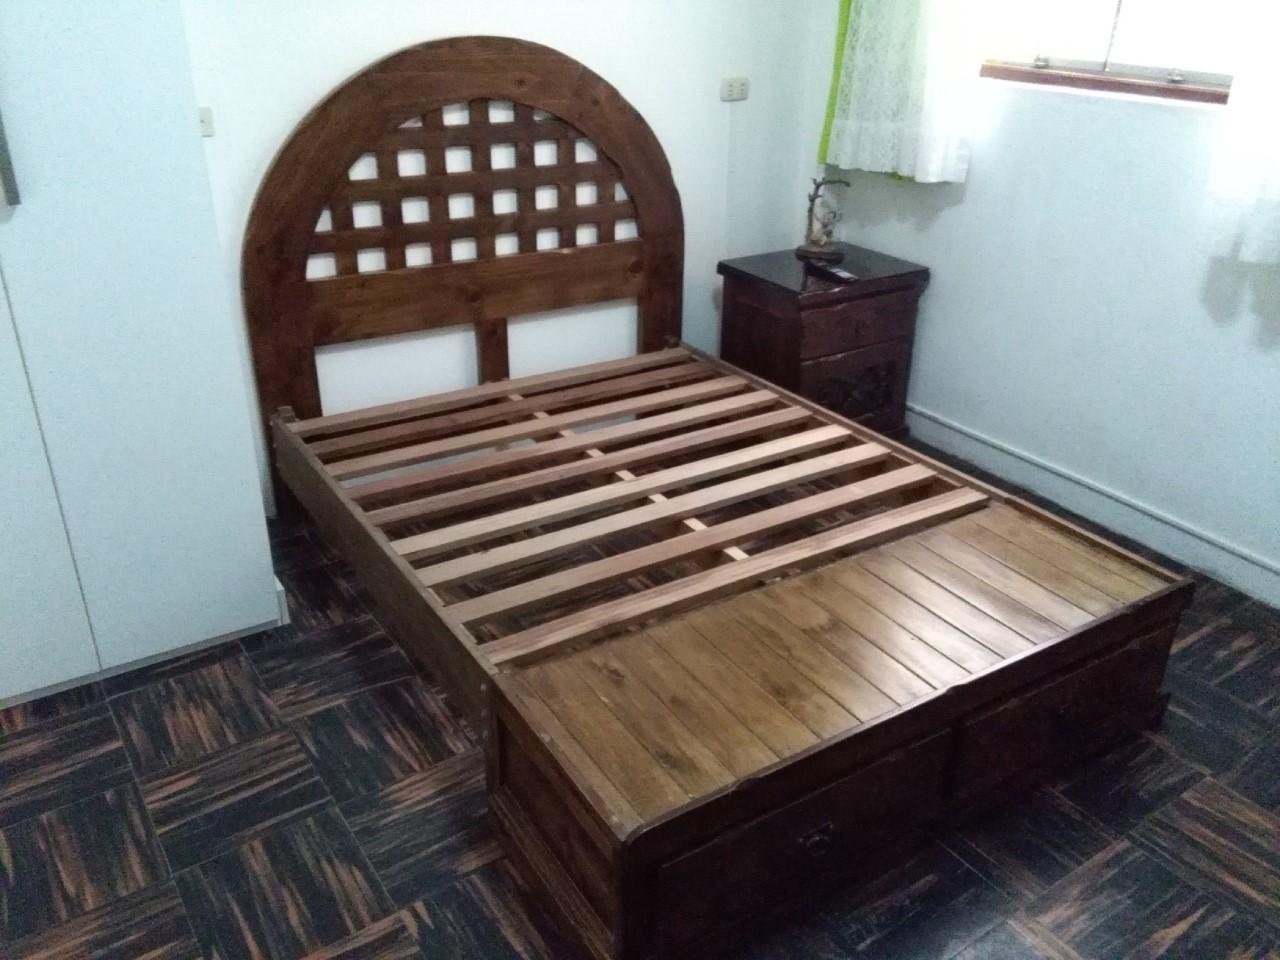 Cama 2 plazas modelo circular muebles para el hogar for Tipos de camas de 2plazas